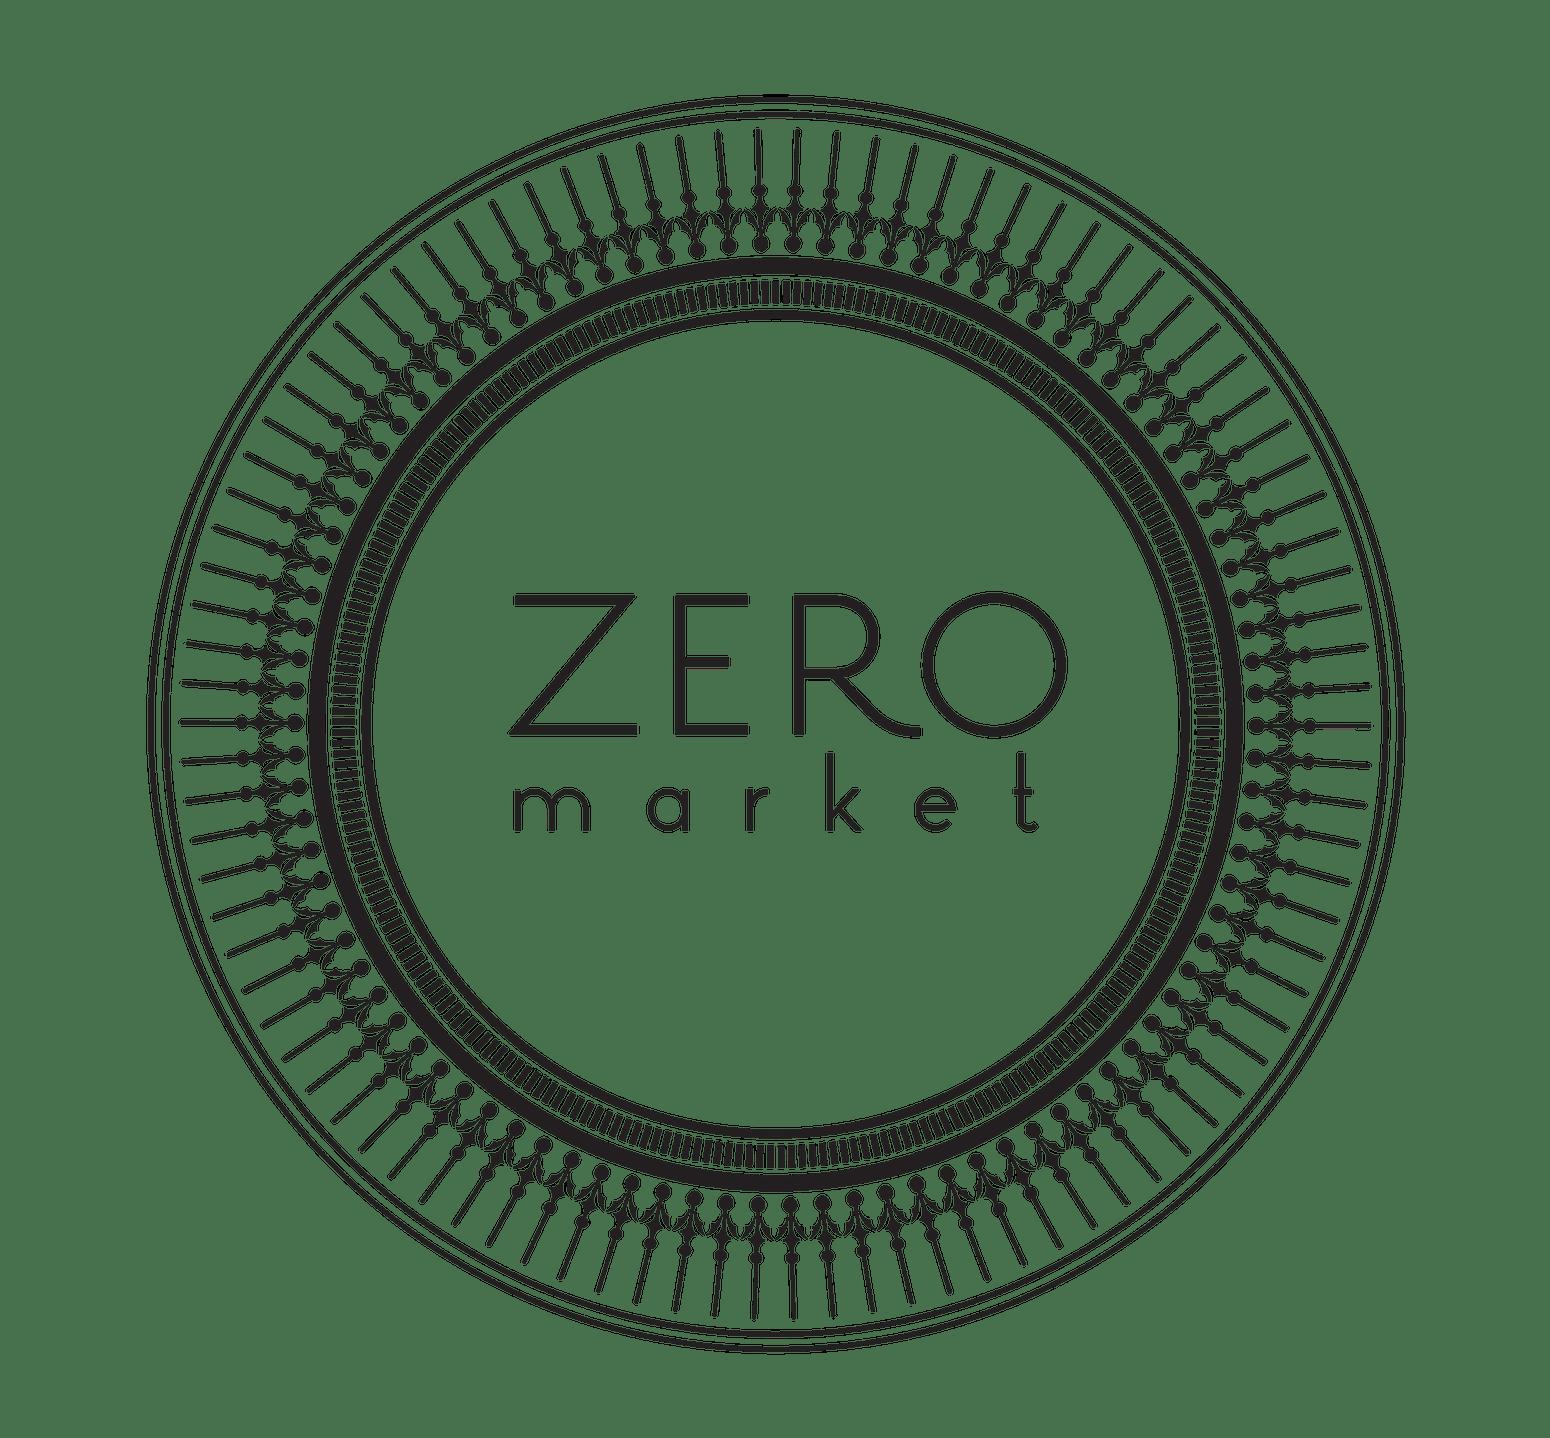 Colorado S First Zero Waste Market Launches Campaign To